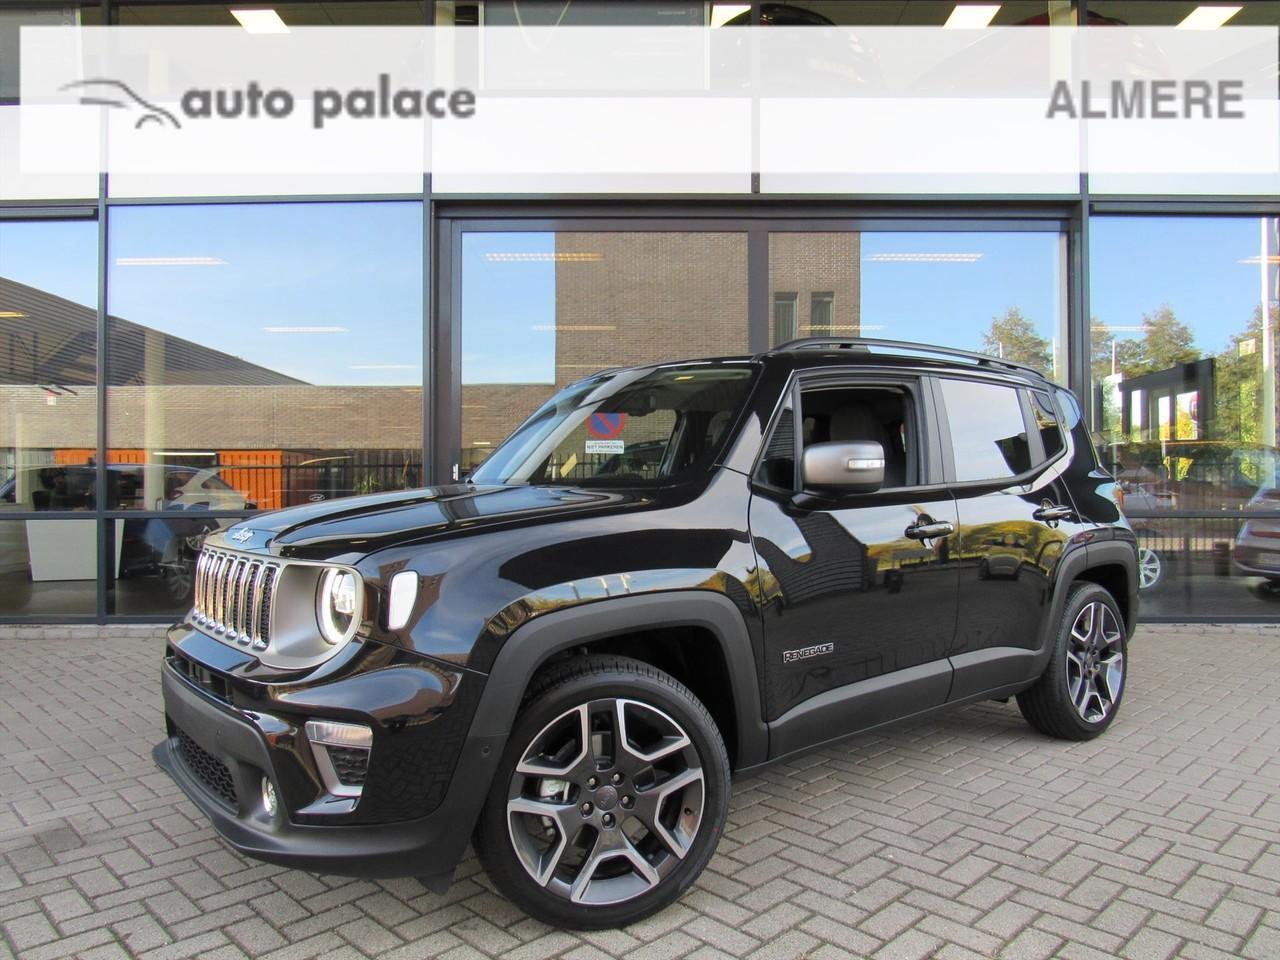 Jeep Renegade 1.0 multiair 120pk limited nieuw model 2019